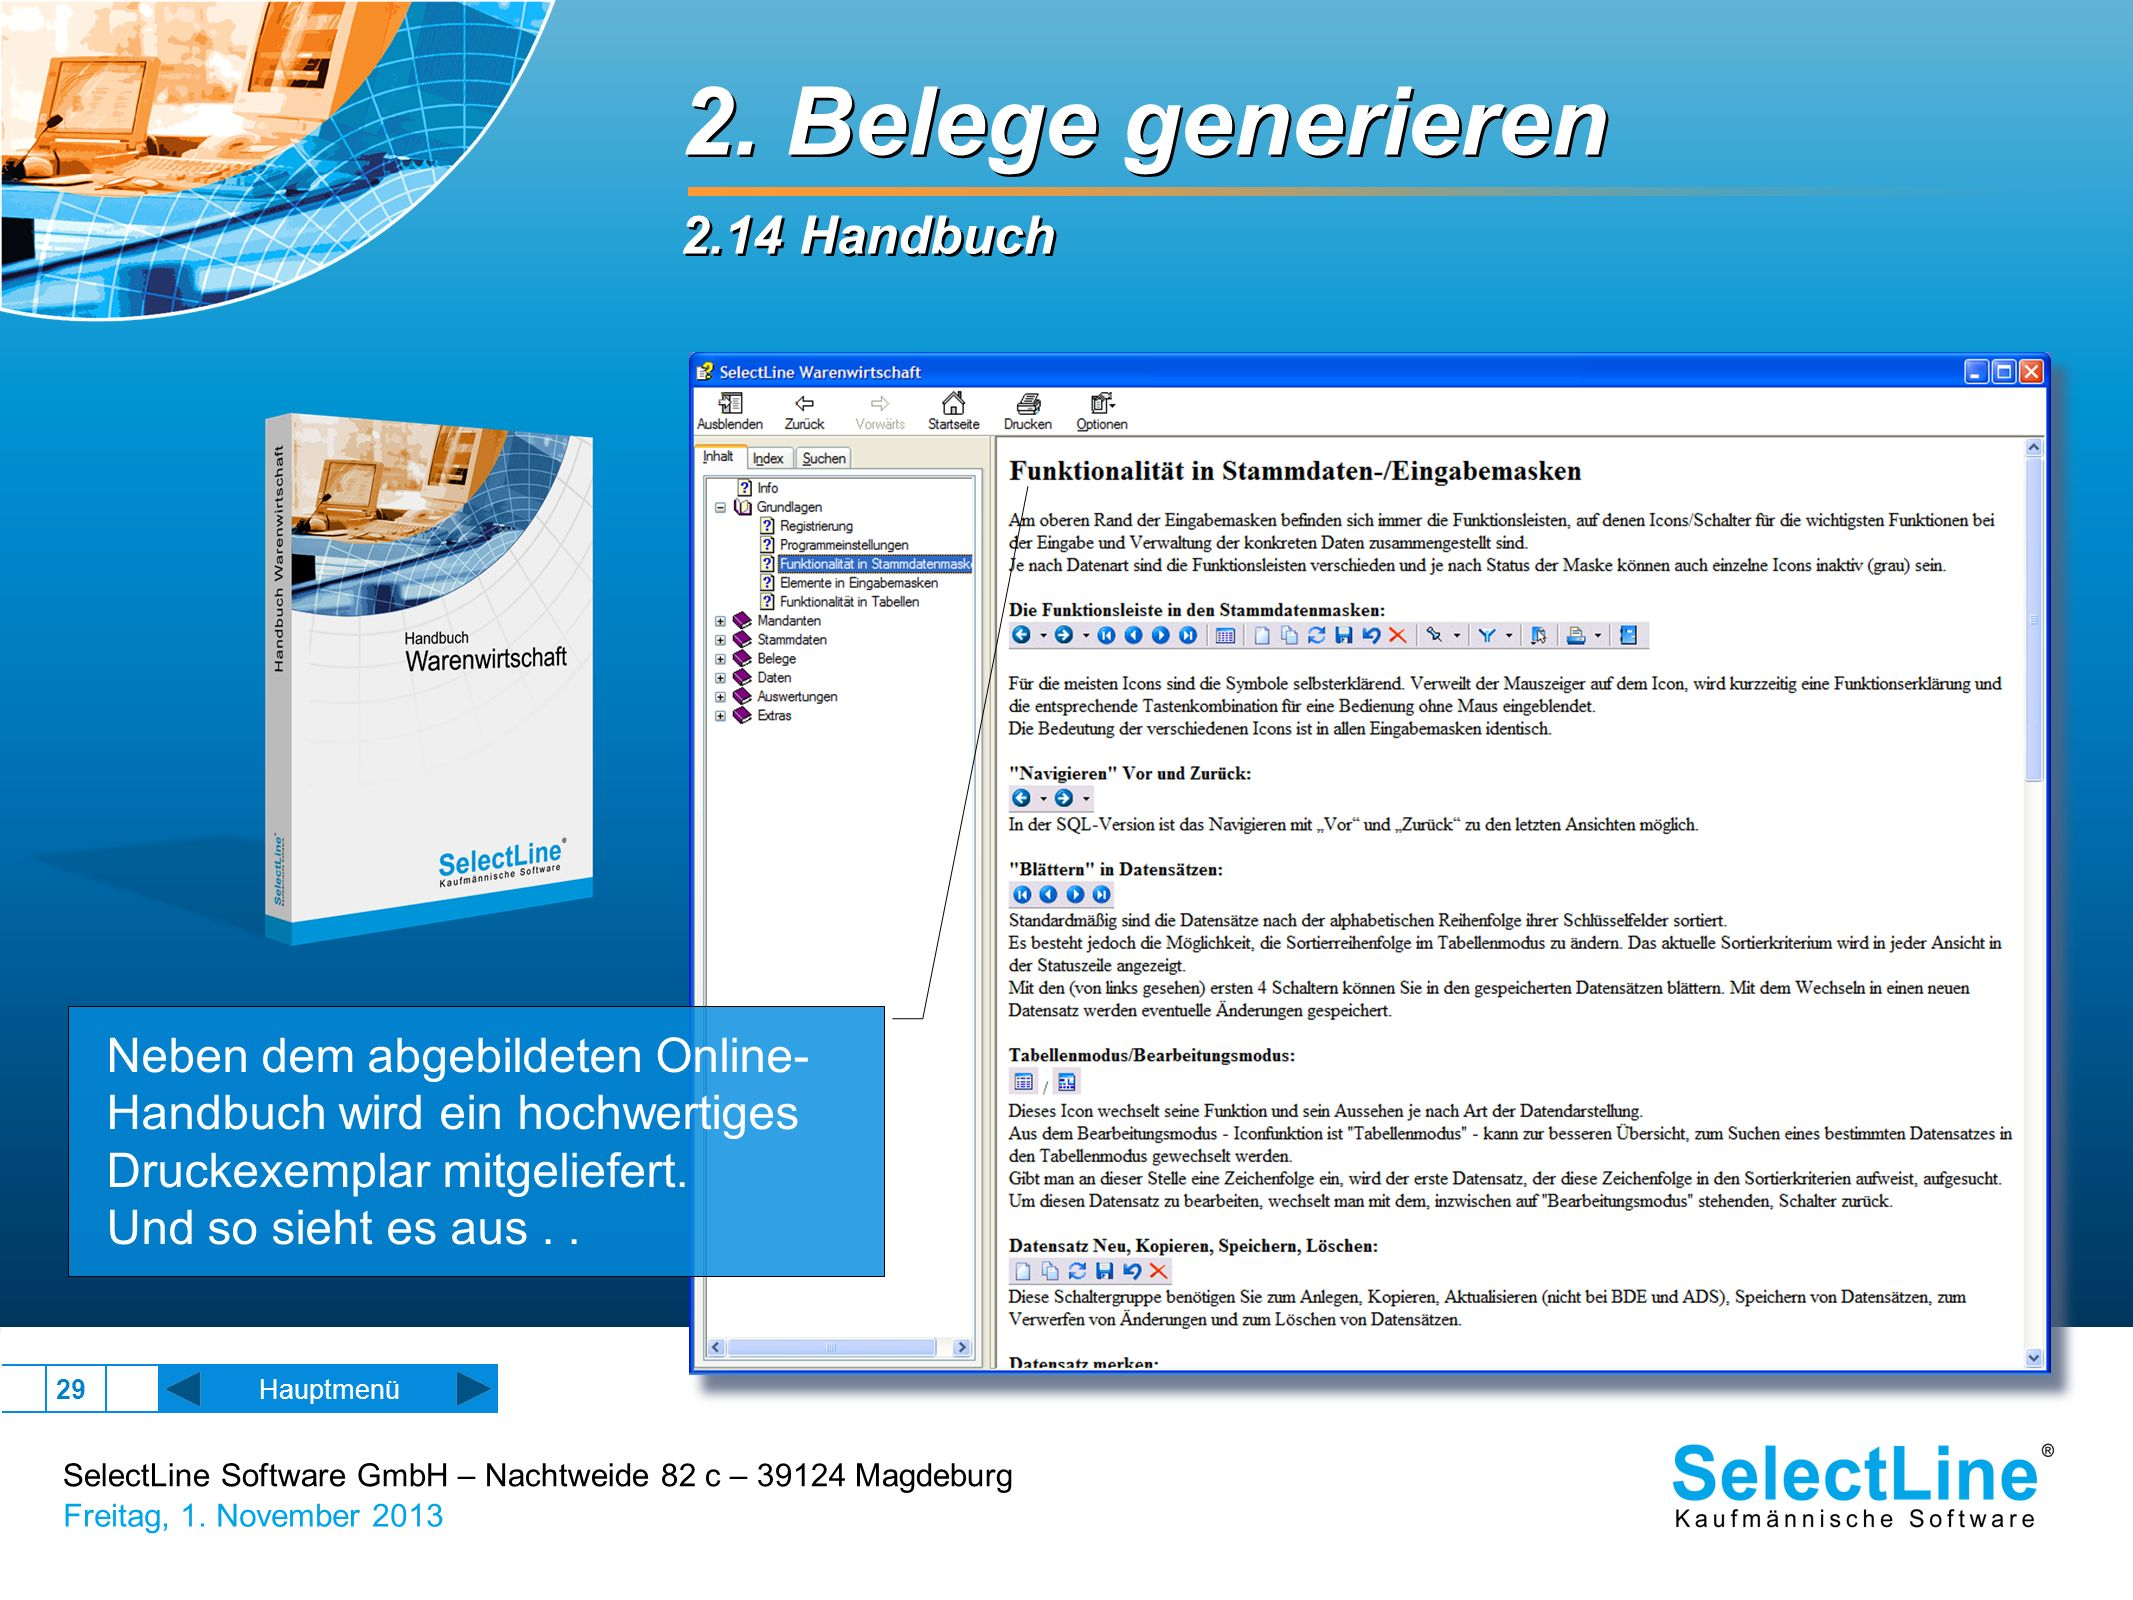 2. Belege generieren 2.14 Handbuch